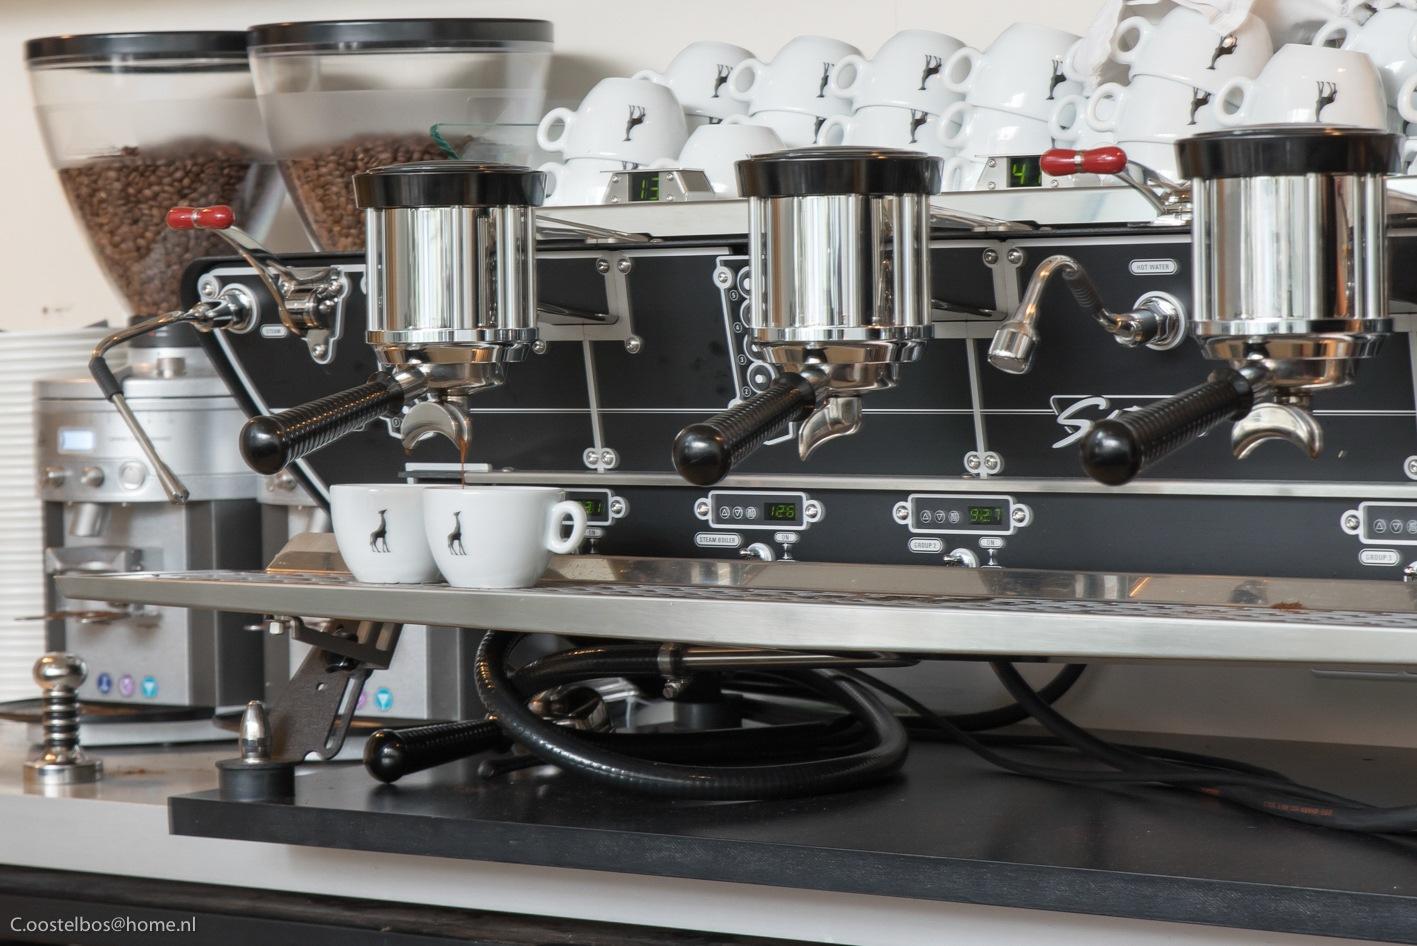 Koffie-Spirit-Latte Art-Kees van der westen